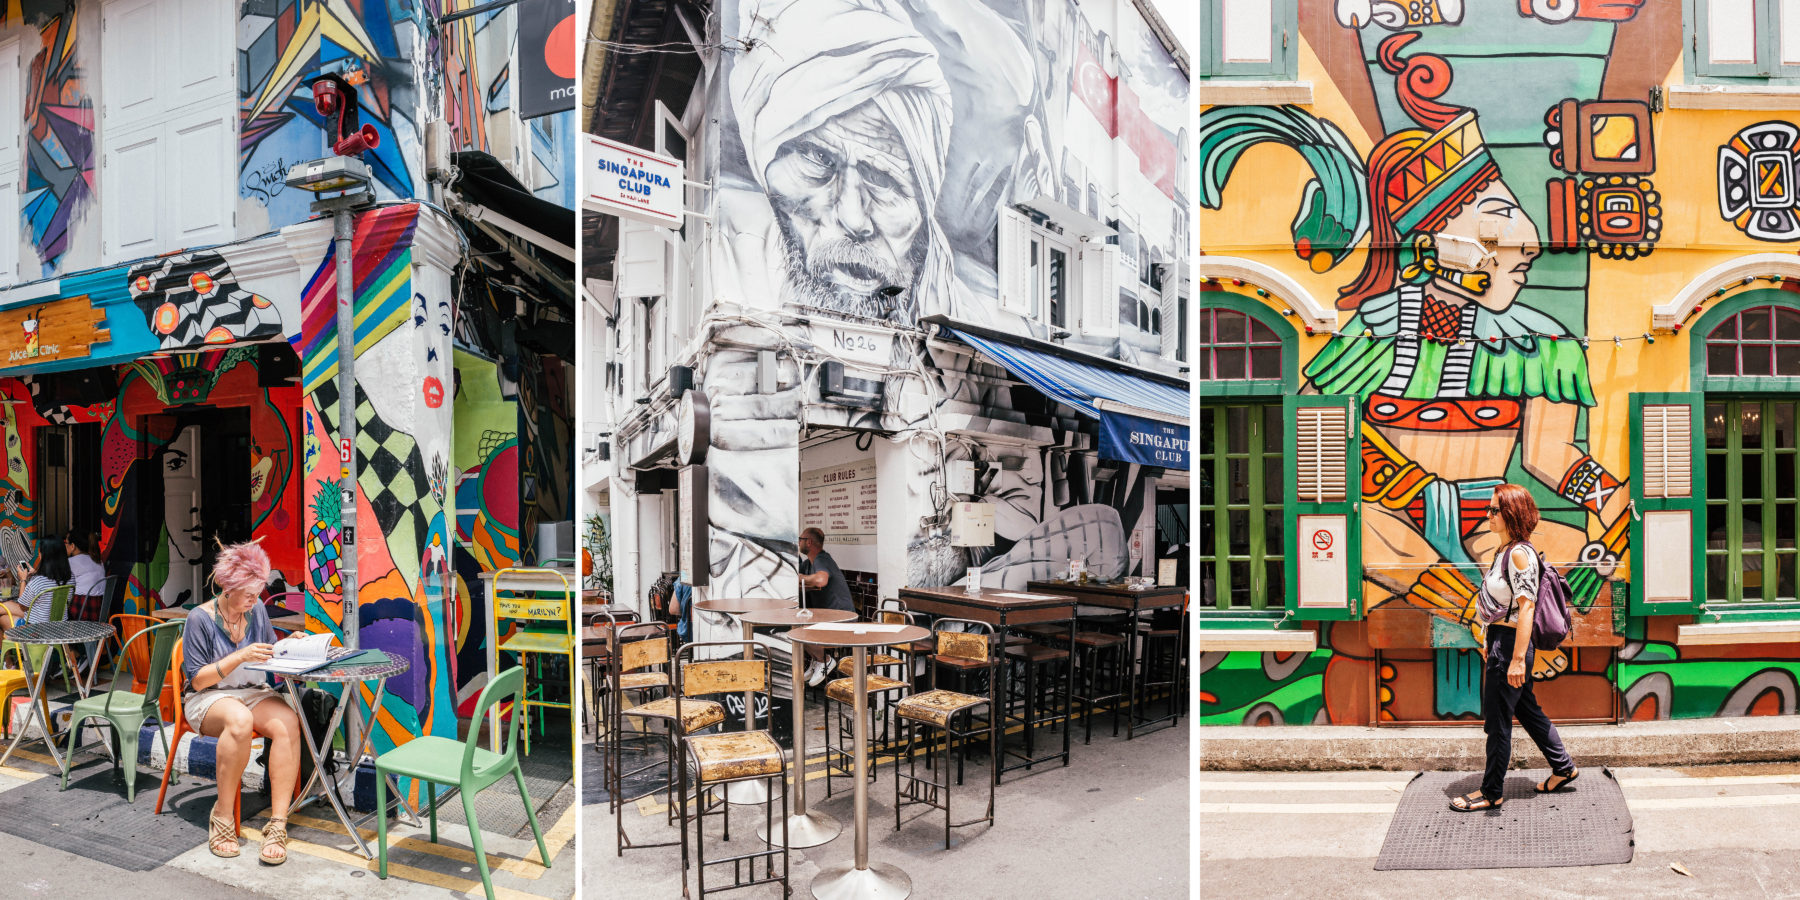 singapore coffee shops haji lane hipster caffeine exploring cafes graffiti colourful street